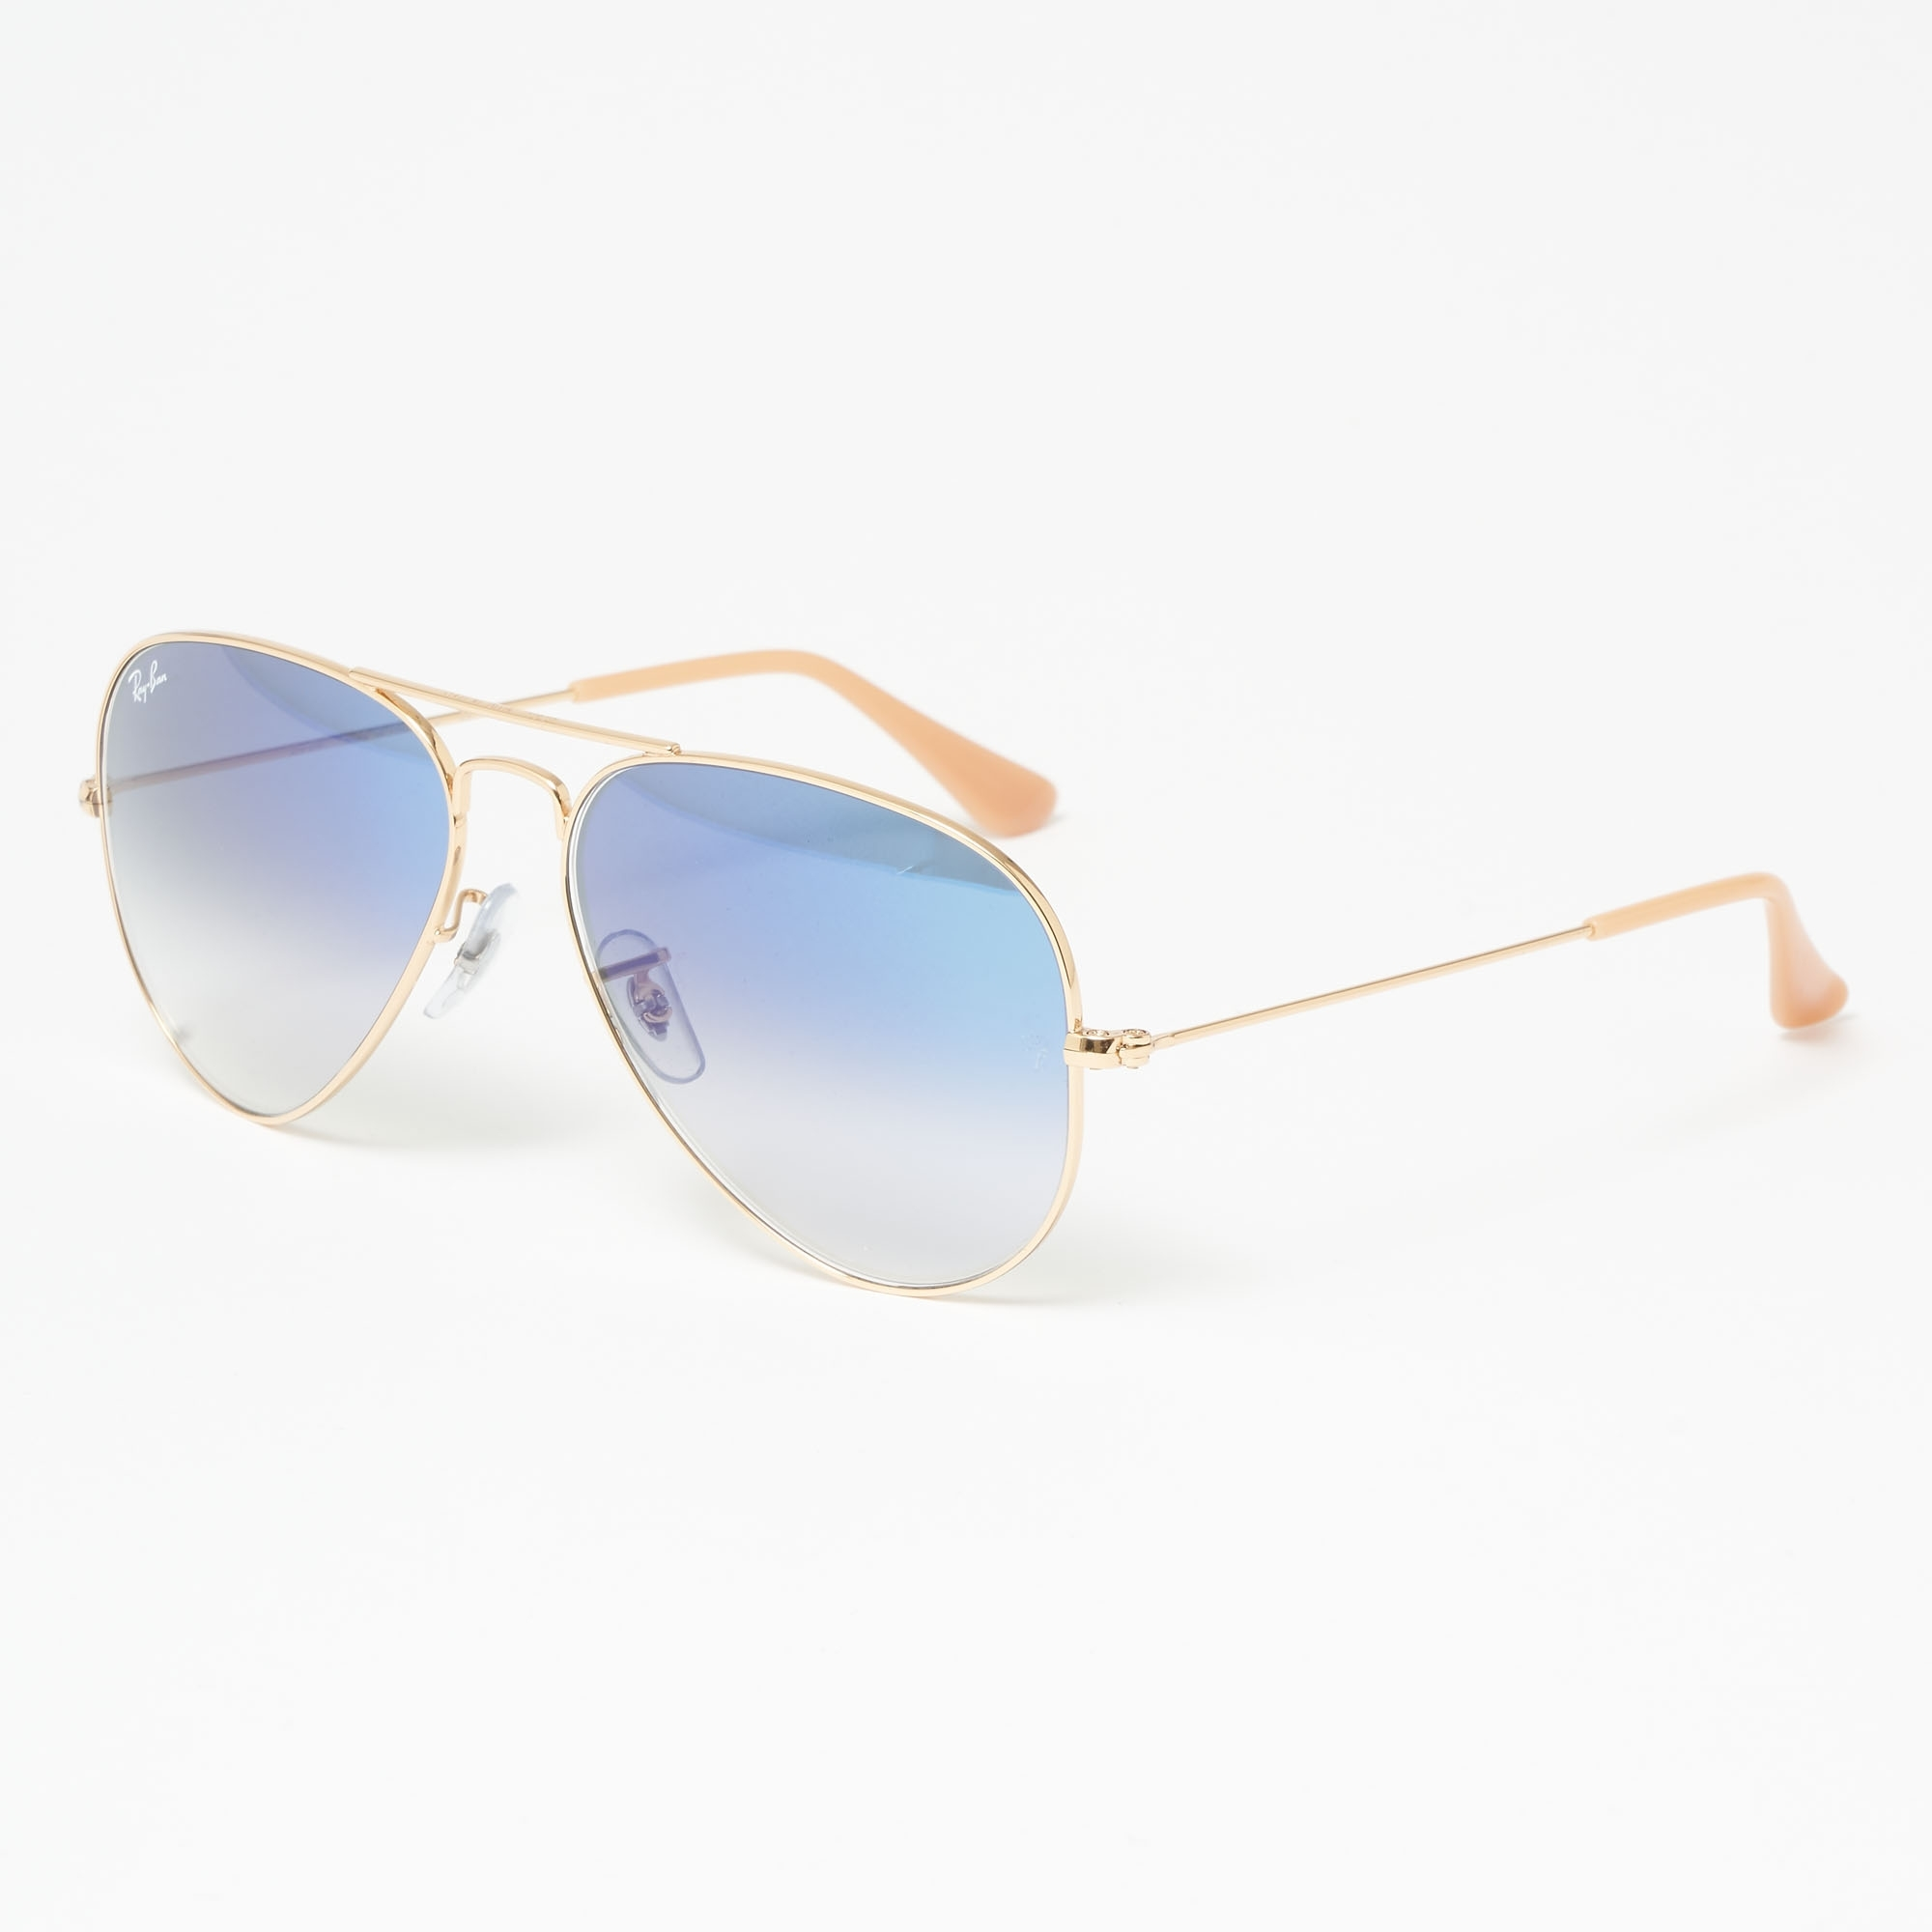 a111f13e1 Gold Aviator Gradient Sunglasses - Light Blue Gradient Lenses